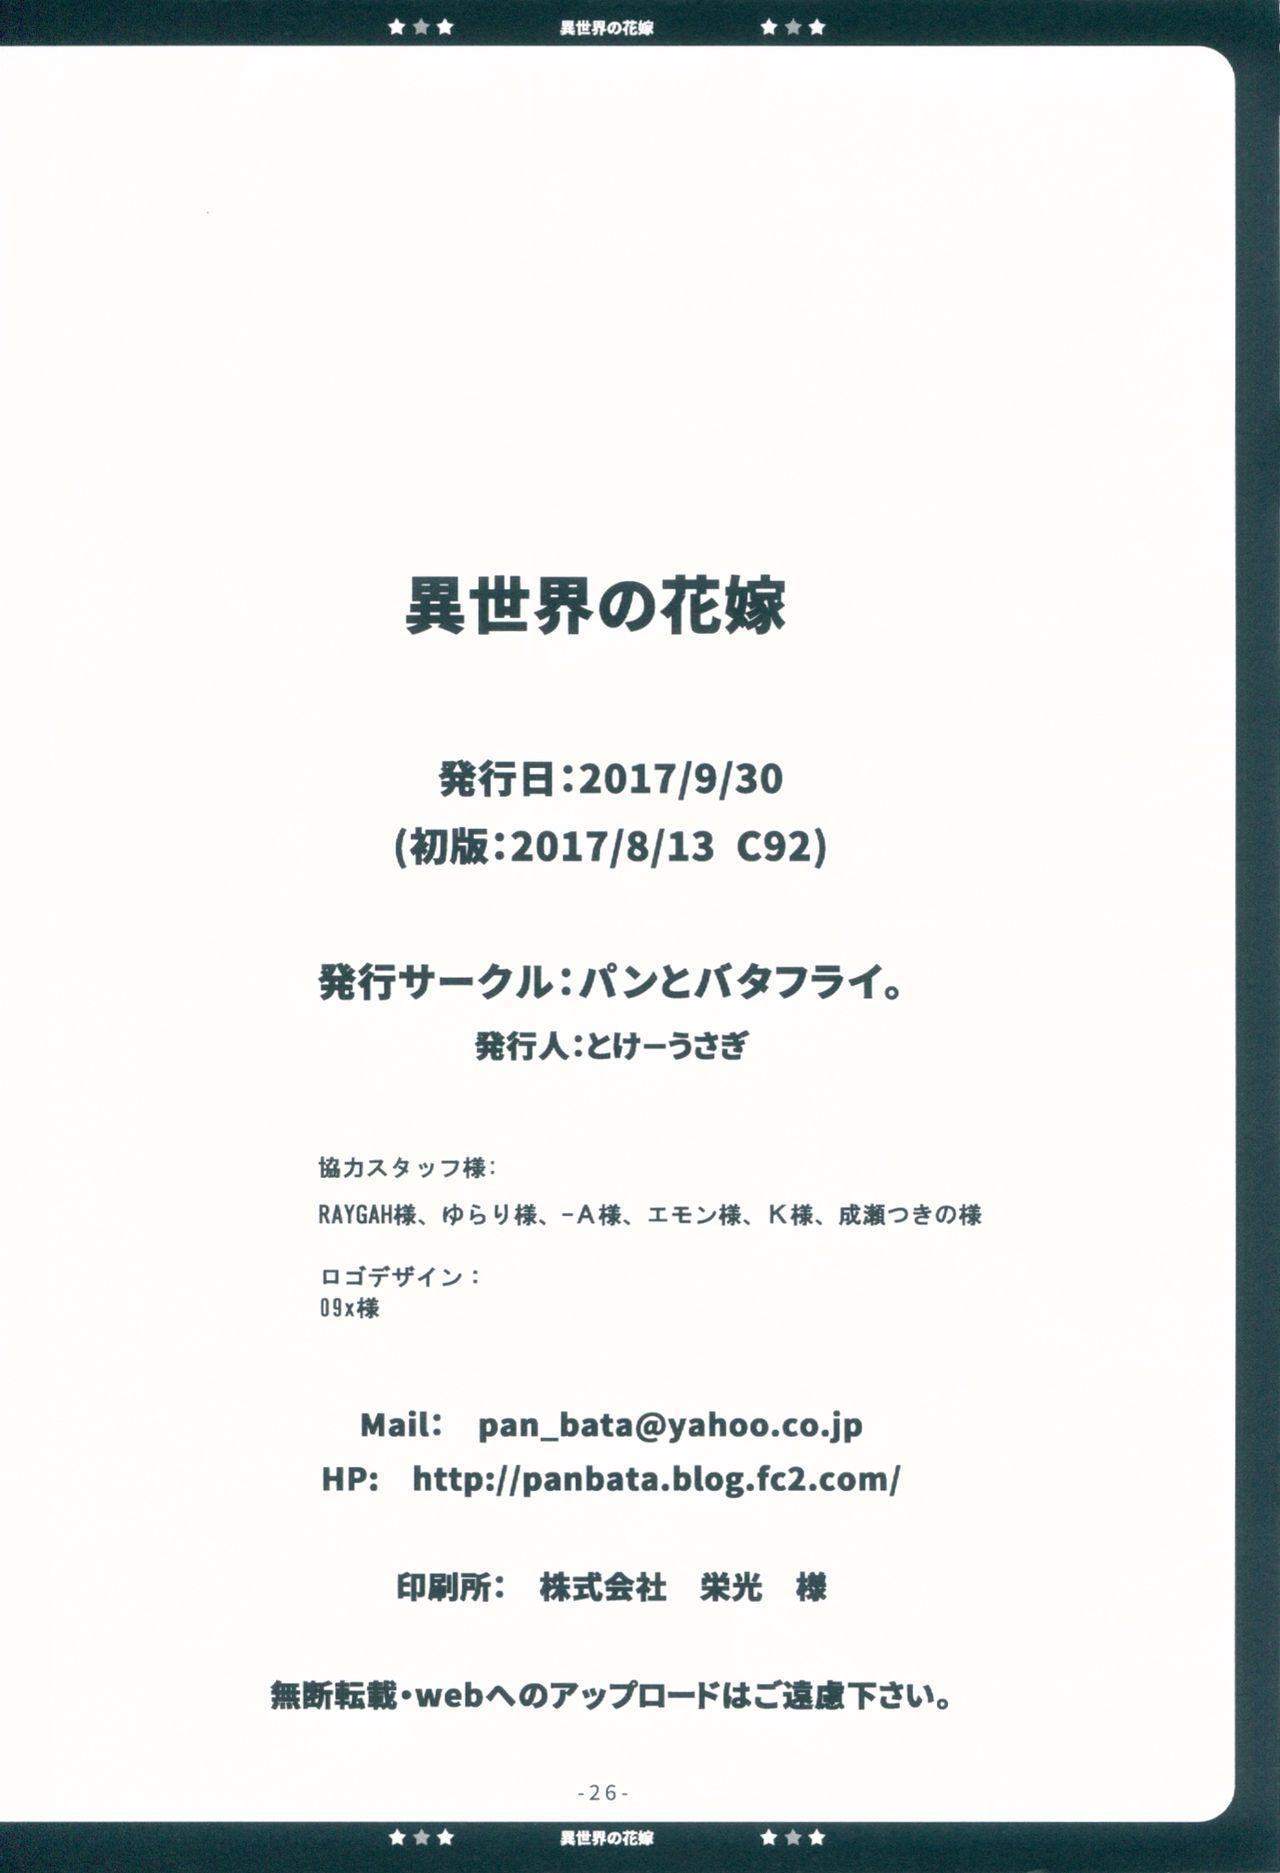 Isekai no Hanayome 25